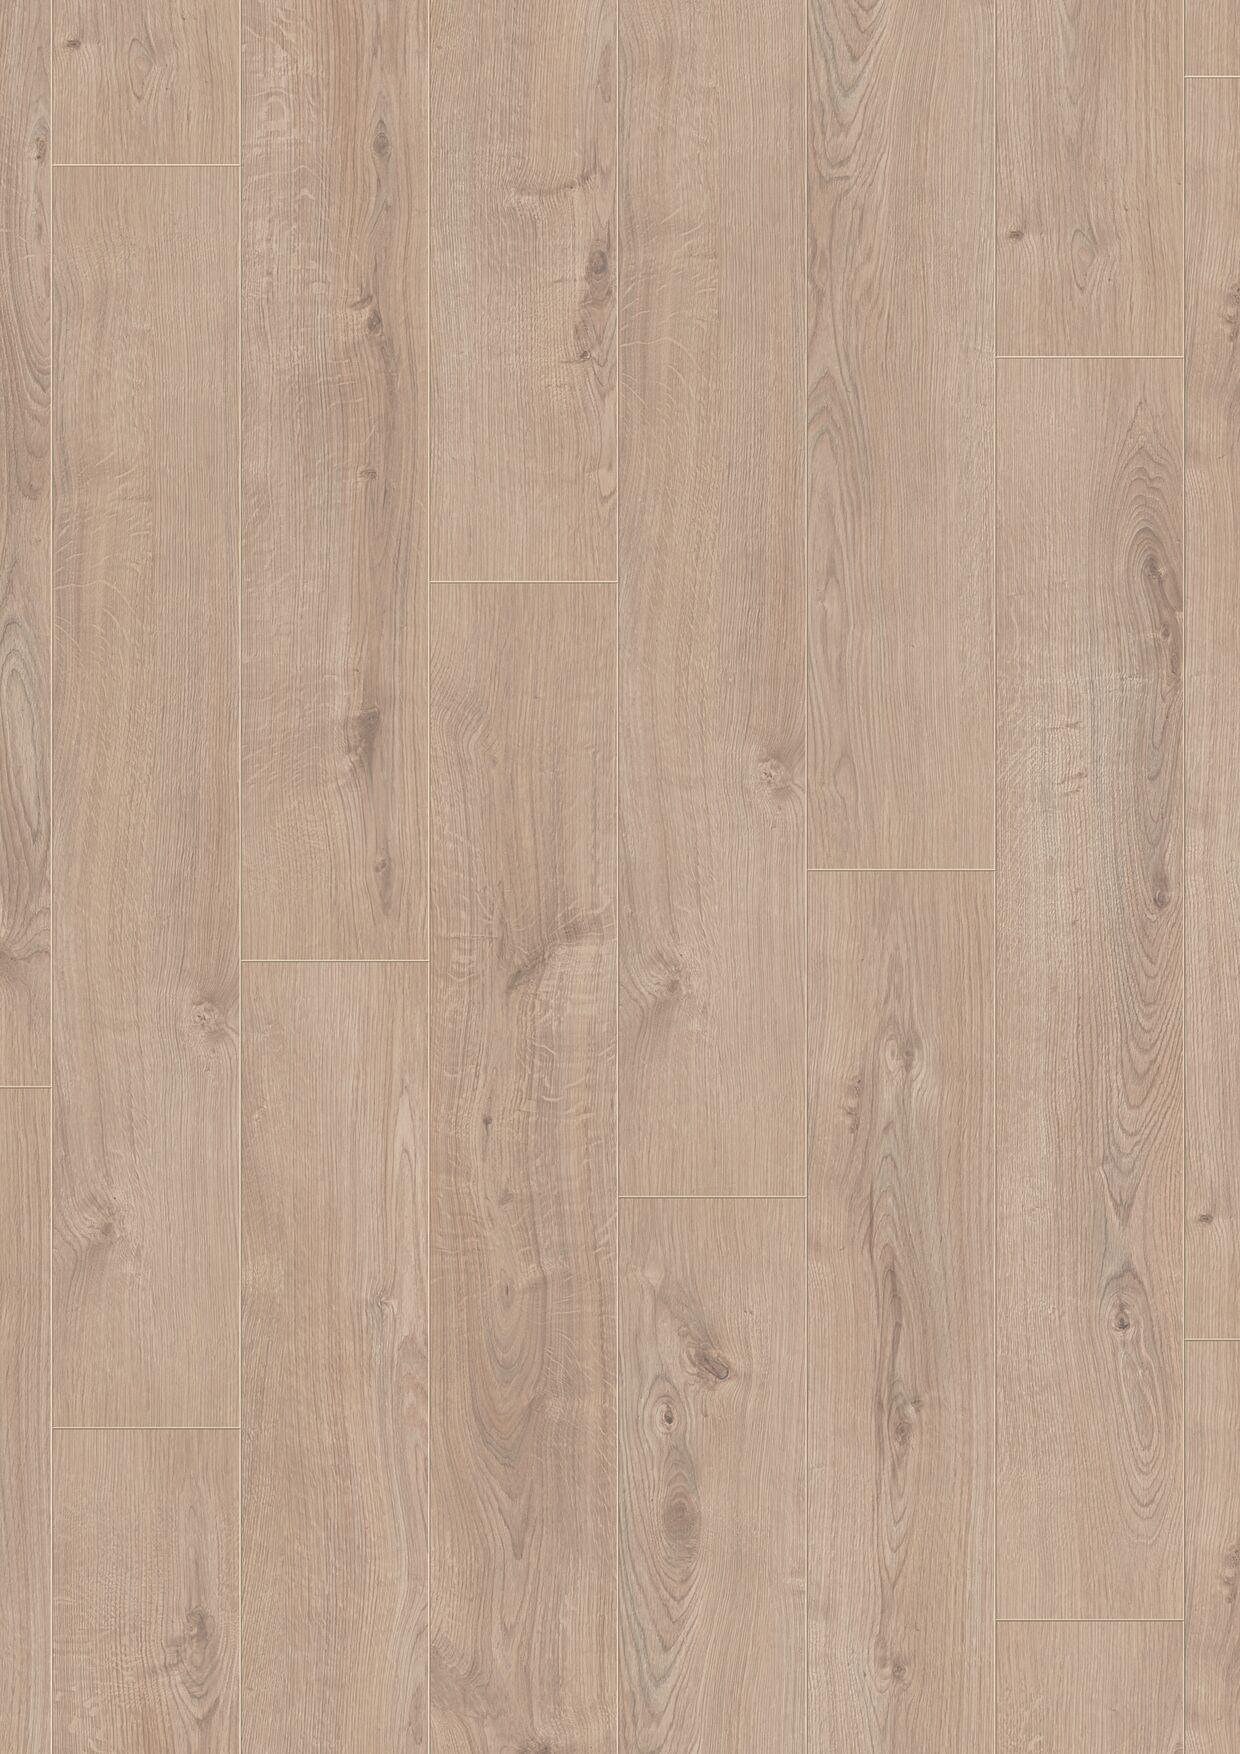 Karras - Ter Hürne - Πάτωμα Laminate Classic Line γκρι μπεζ απόχρωση Oak Light Beige